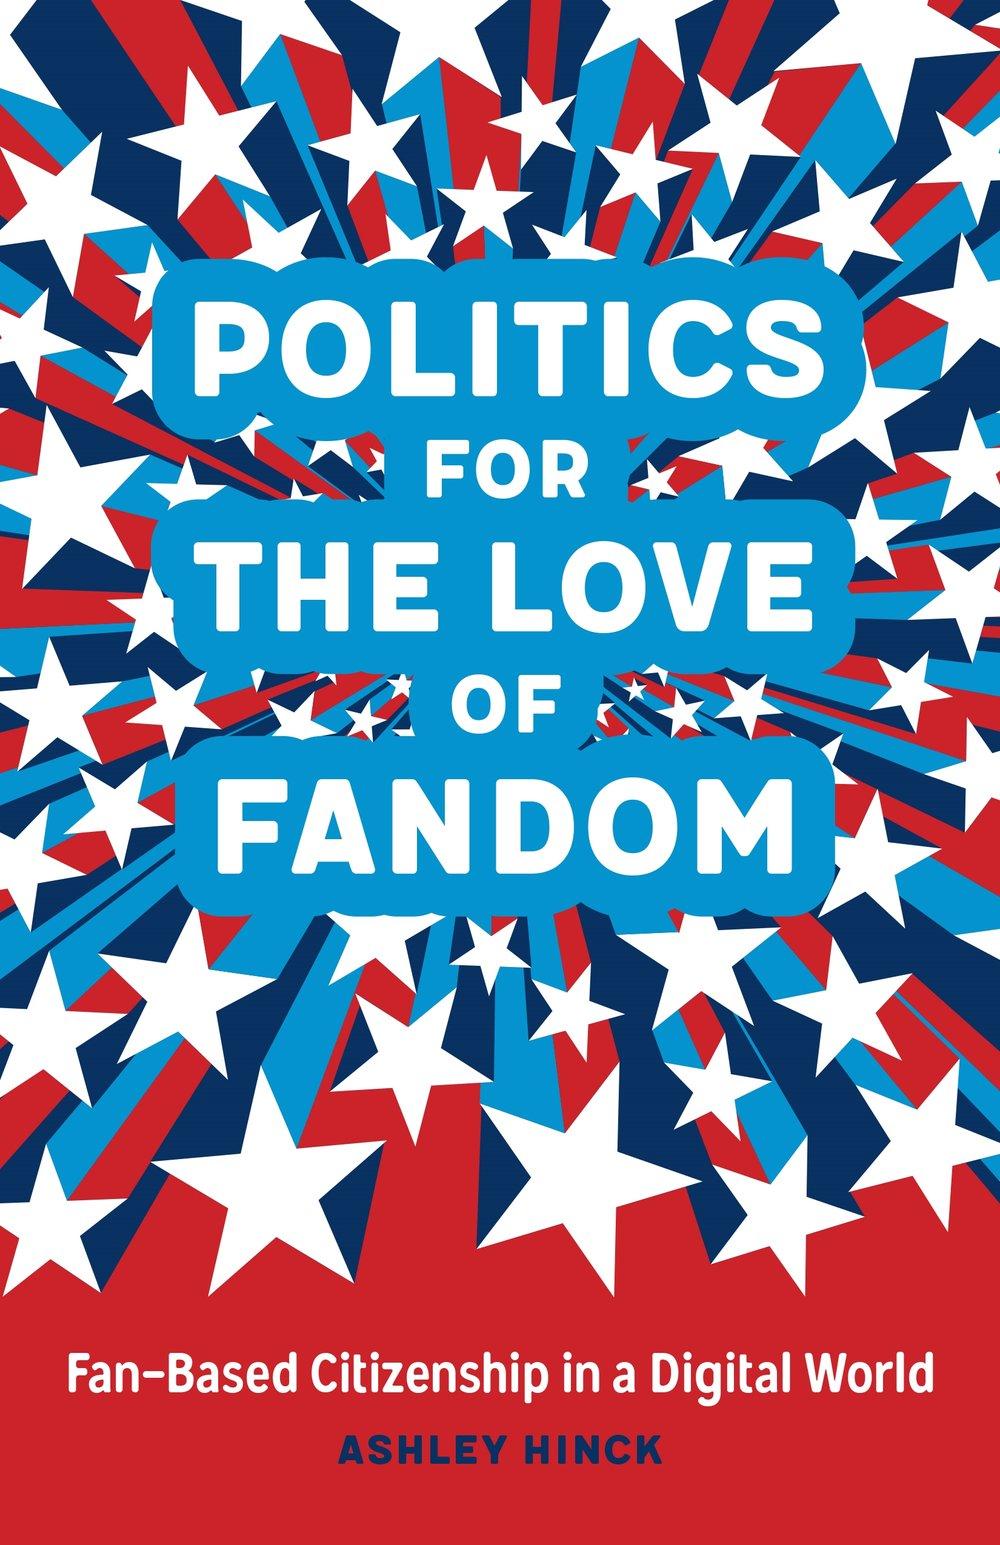 Politics for the love of fandom.jpg